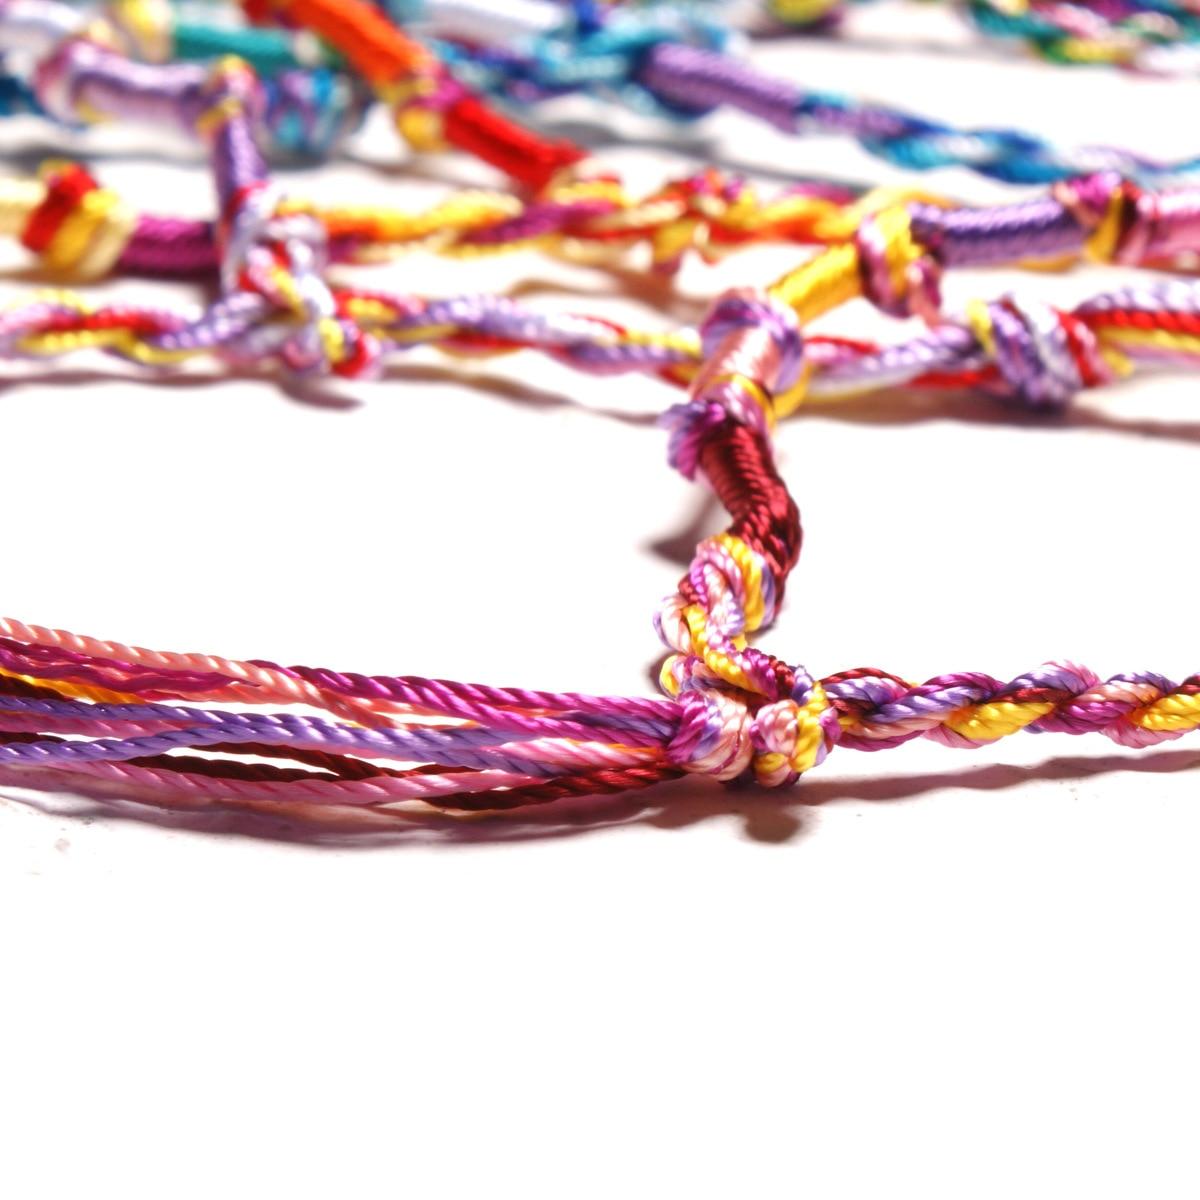 10pc Colorful Woven Braided Friendship Bracelet Handmade Brazilian String Cotton Cord Hippie Surf Men Women Jewelry Gift 4